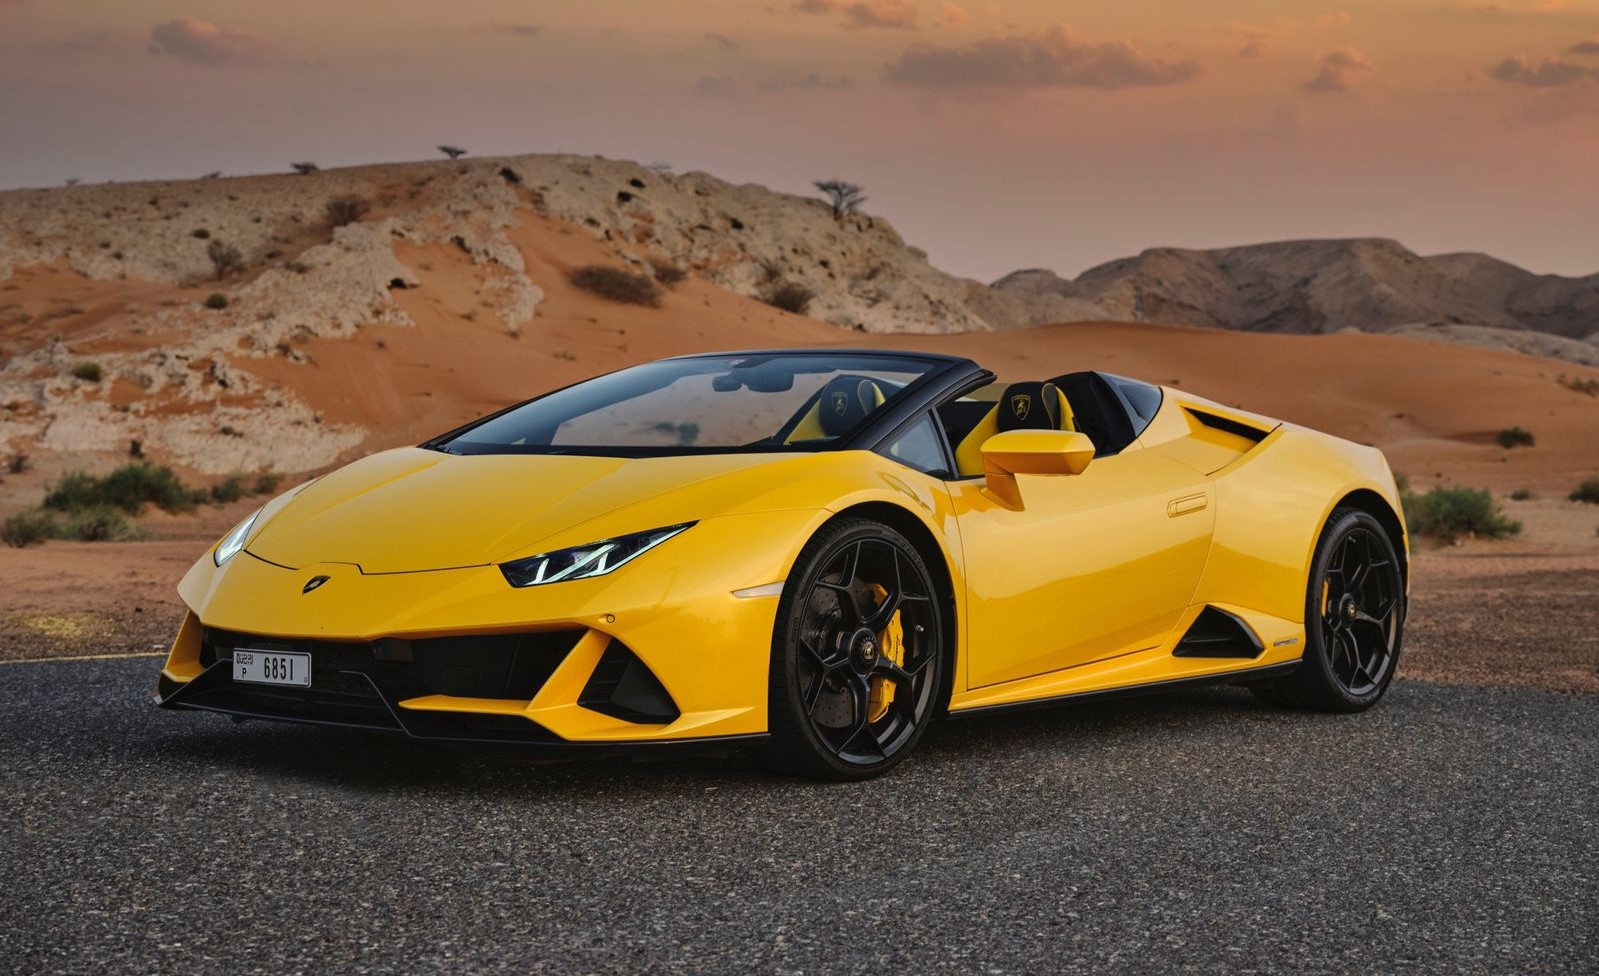 Lamborghini Huracan EVO Spyder Rental in Dubai